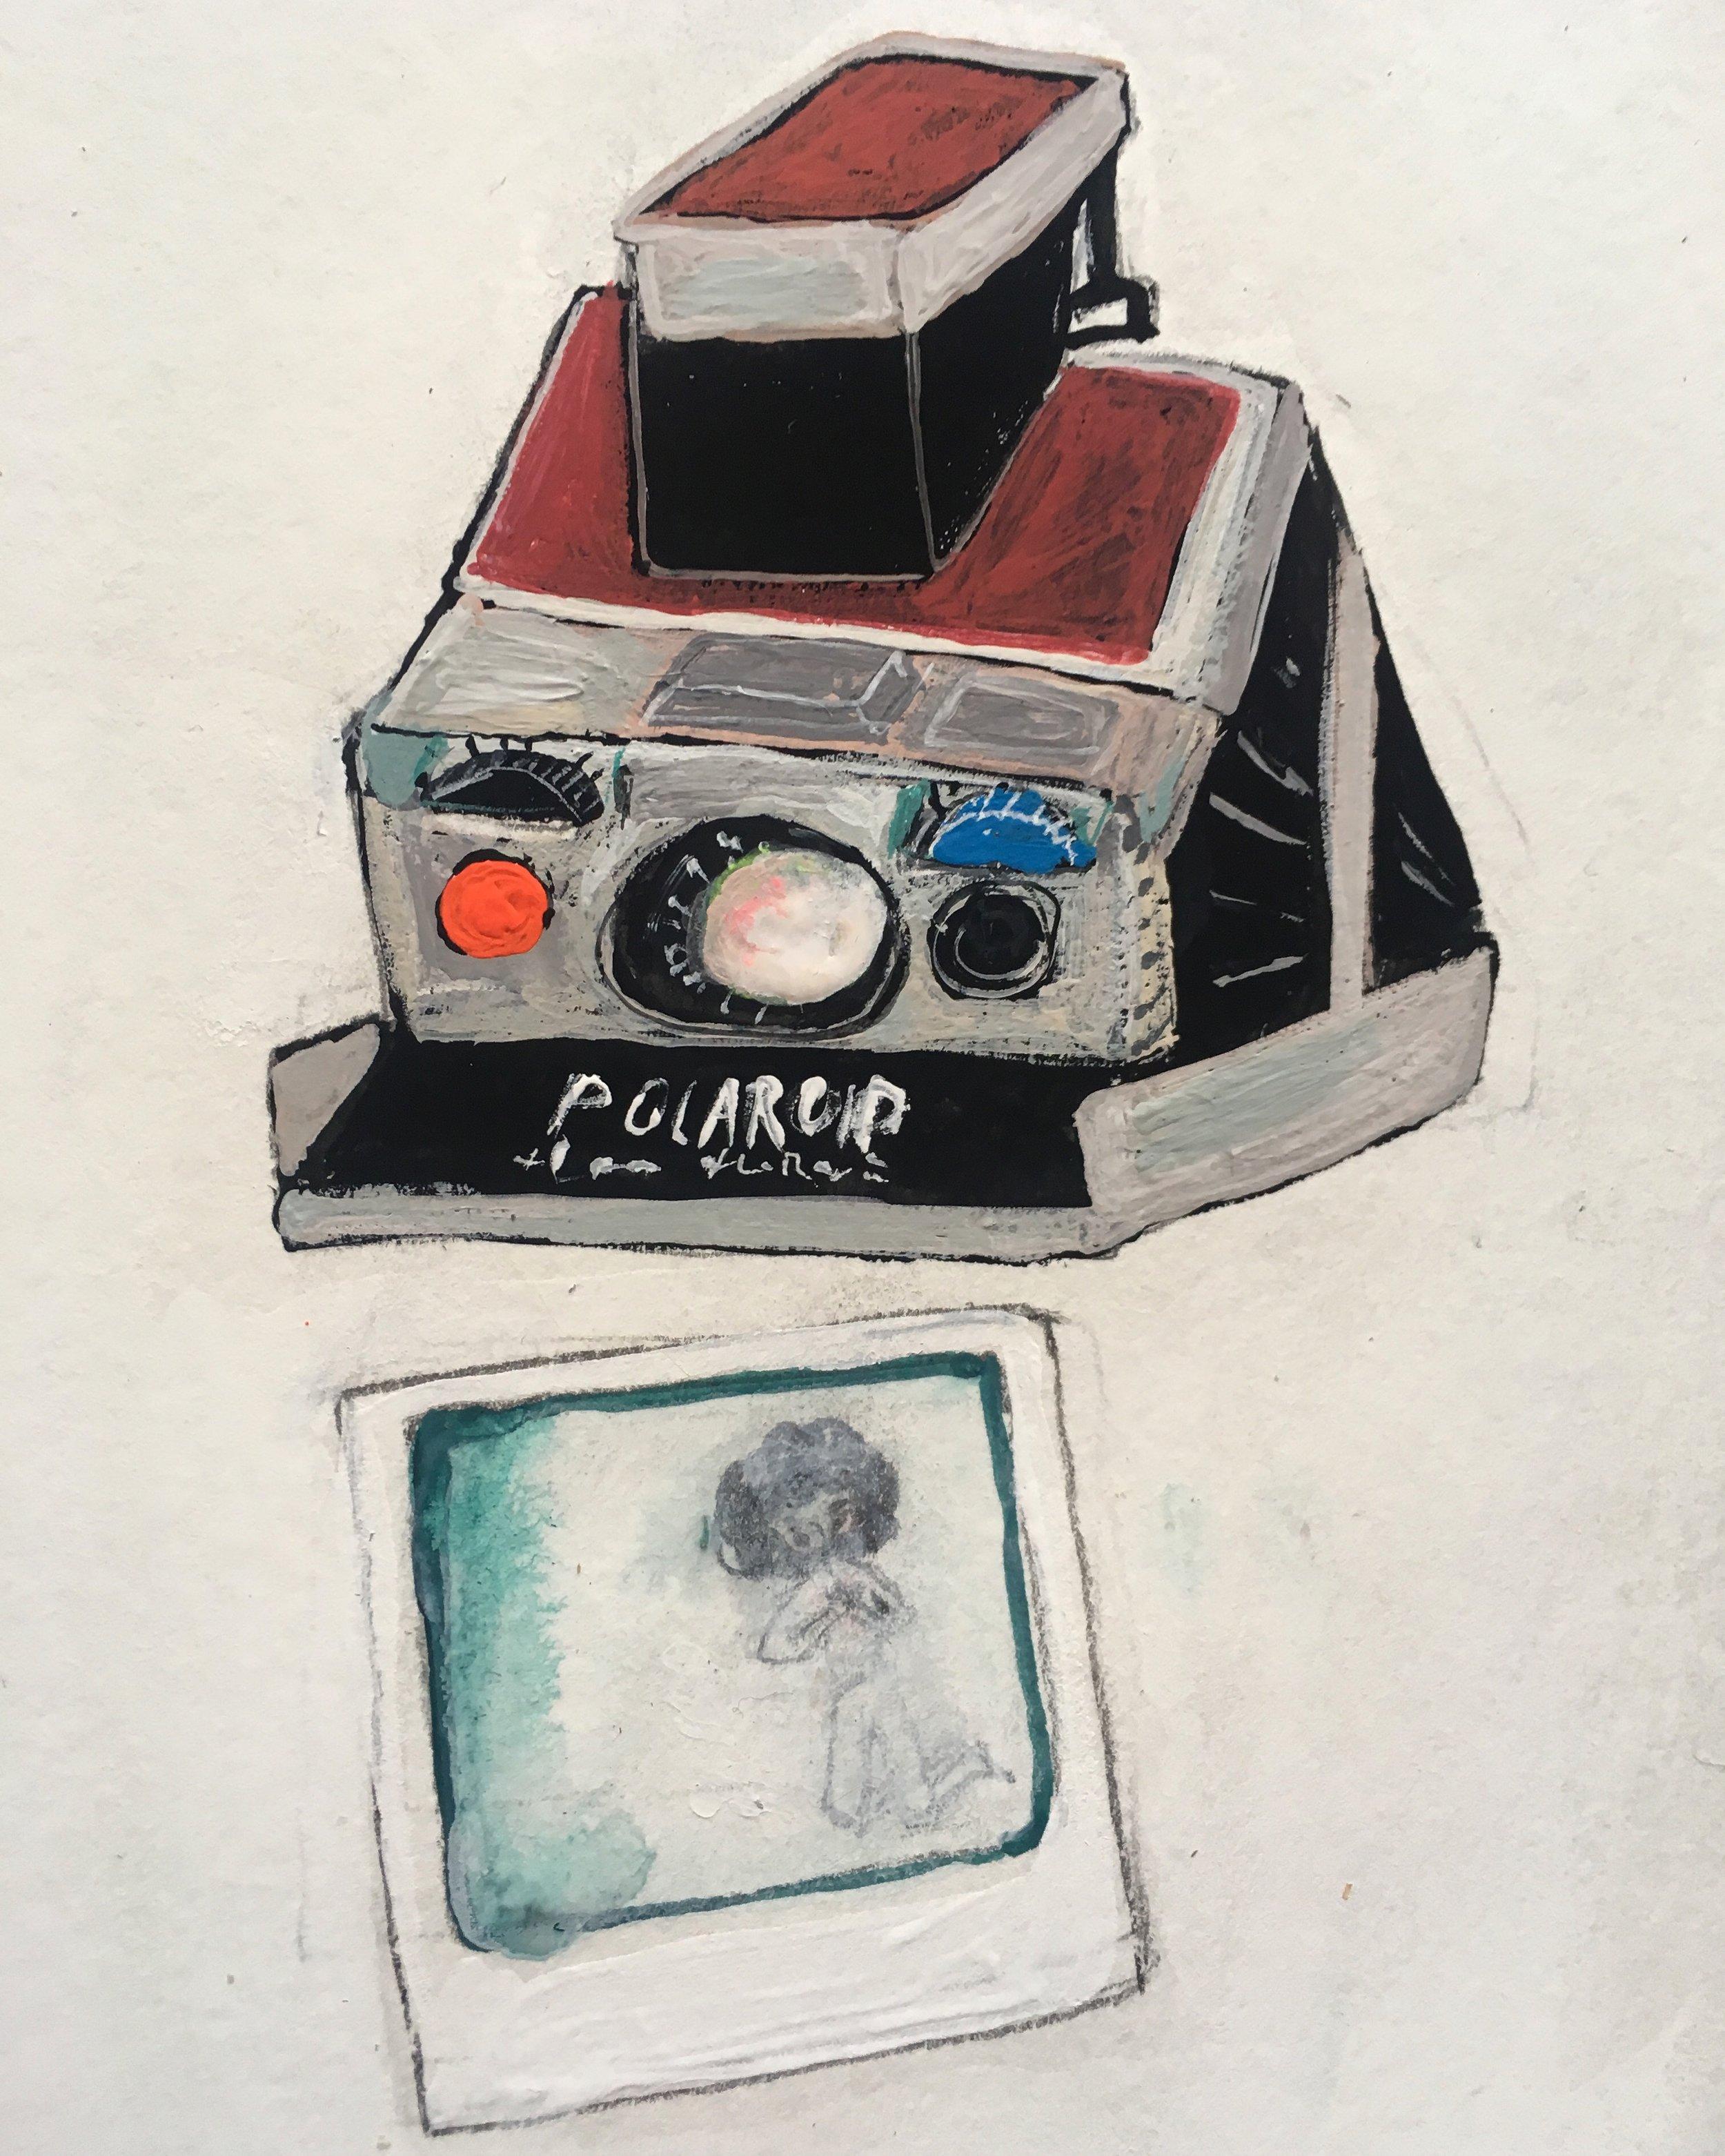 Polaroid (Developing!)